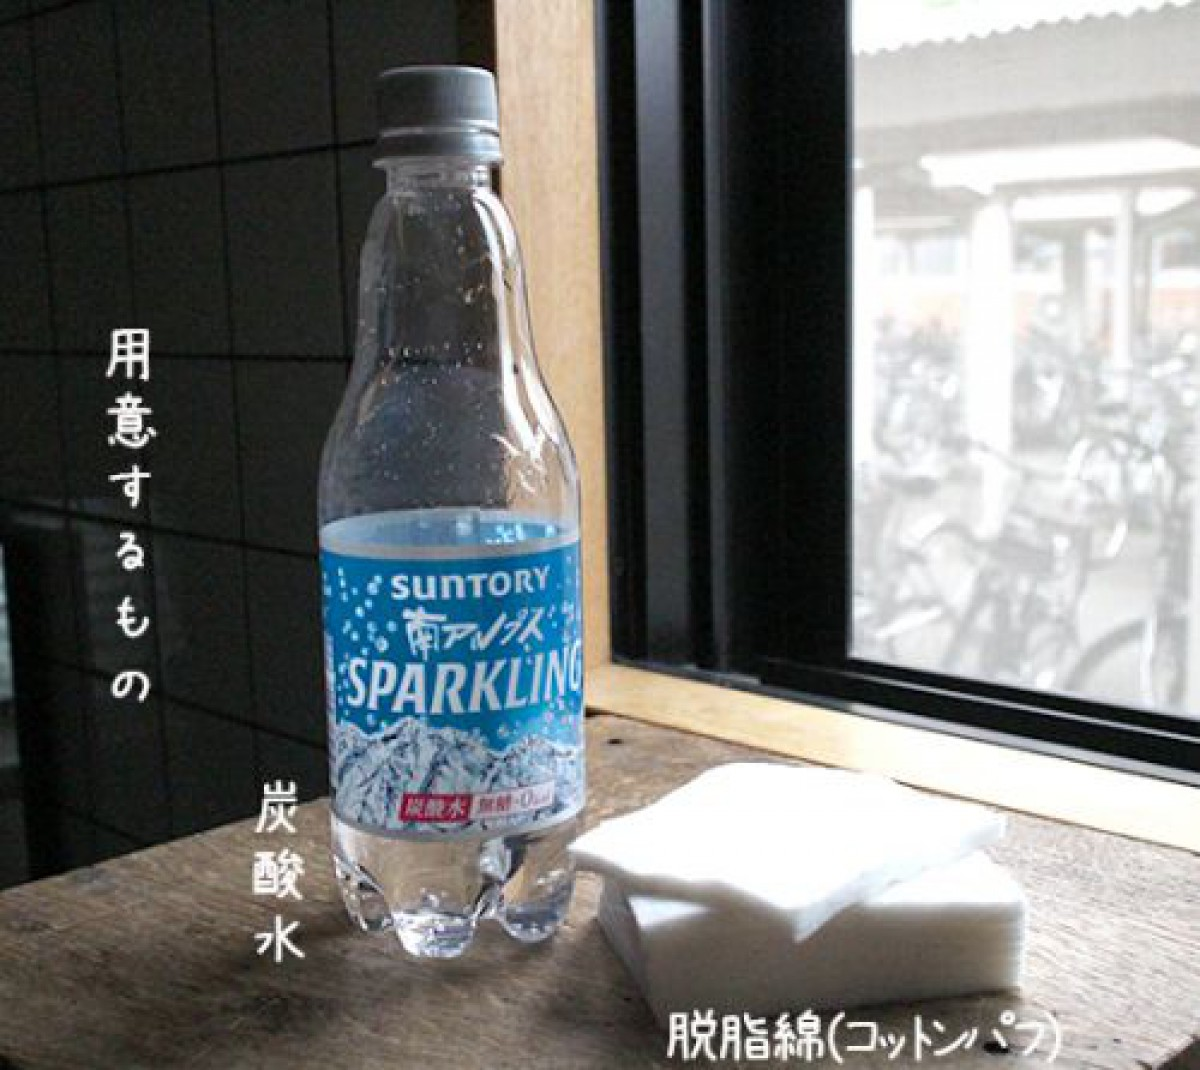 【NHKあさイチ】炭酸水でニキビ肌荒れ改善⁉炭酸パックのやり方